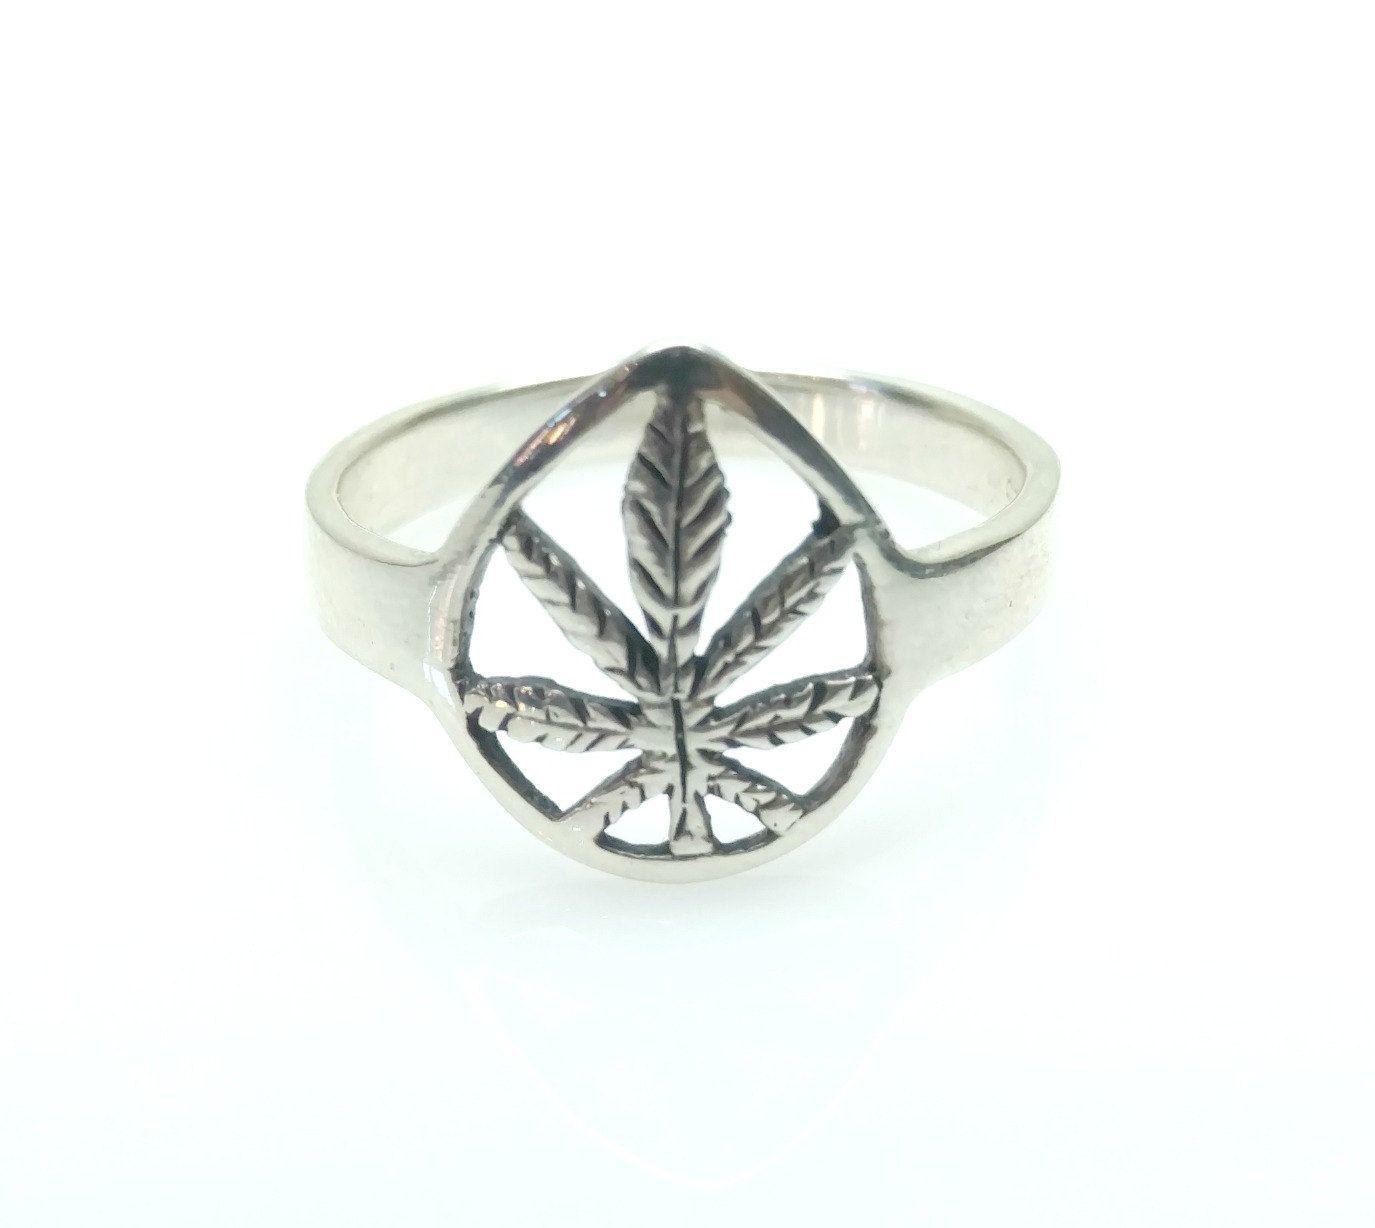 Vintage Sterling Silver Pot Leaf Mary Jane Marijuana Cannibus Leaf Ring Size 9.5 by TheGemmary on Etsy